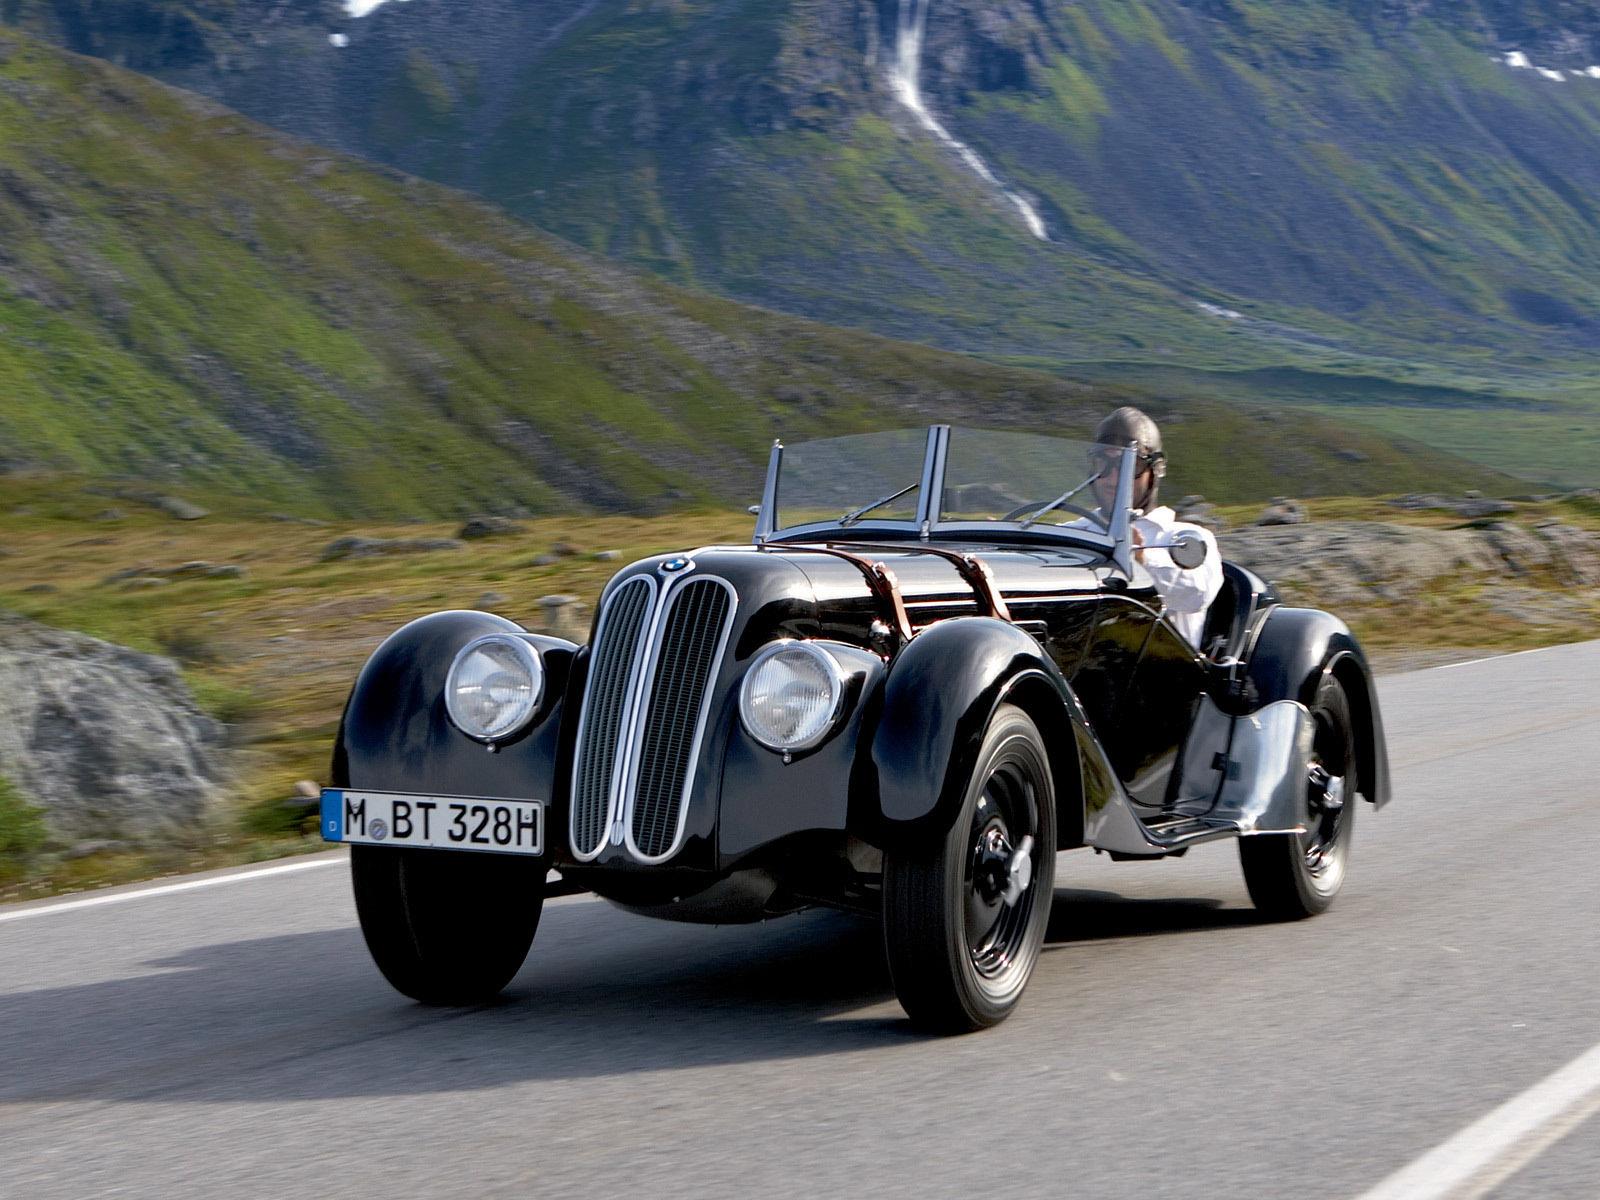 Sports car BMW 328 — the car that brought Bayerische Motorenwerke worldwide fame (1936)